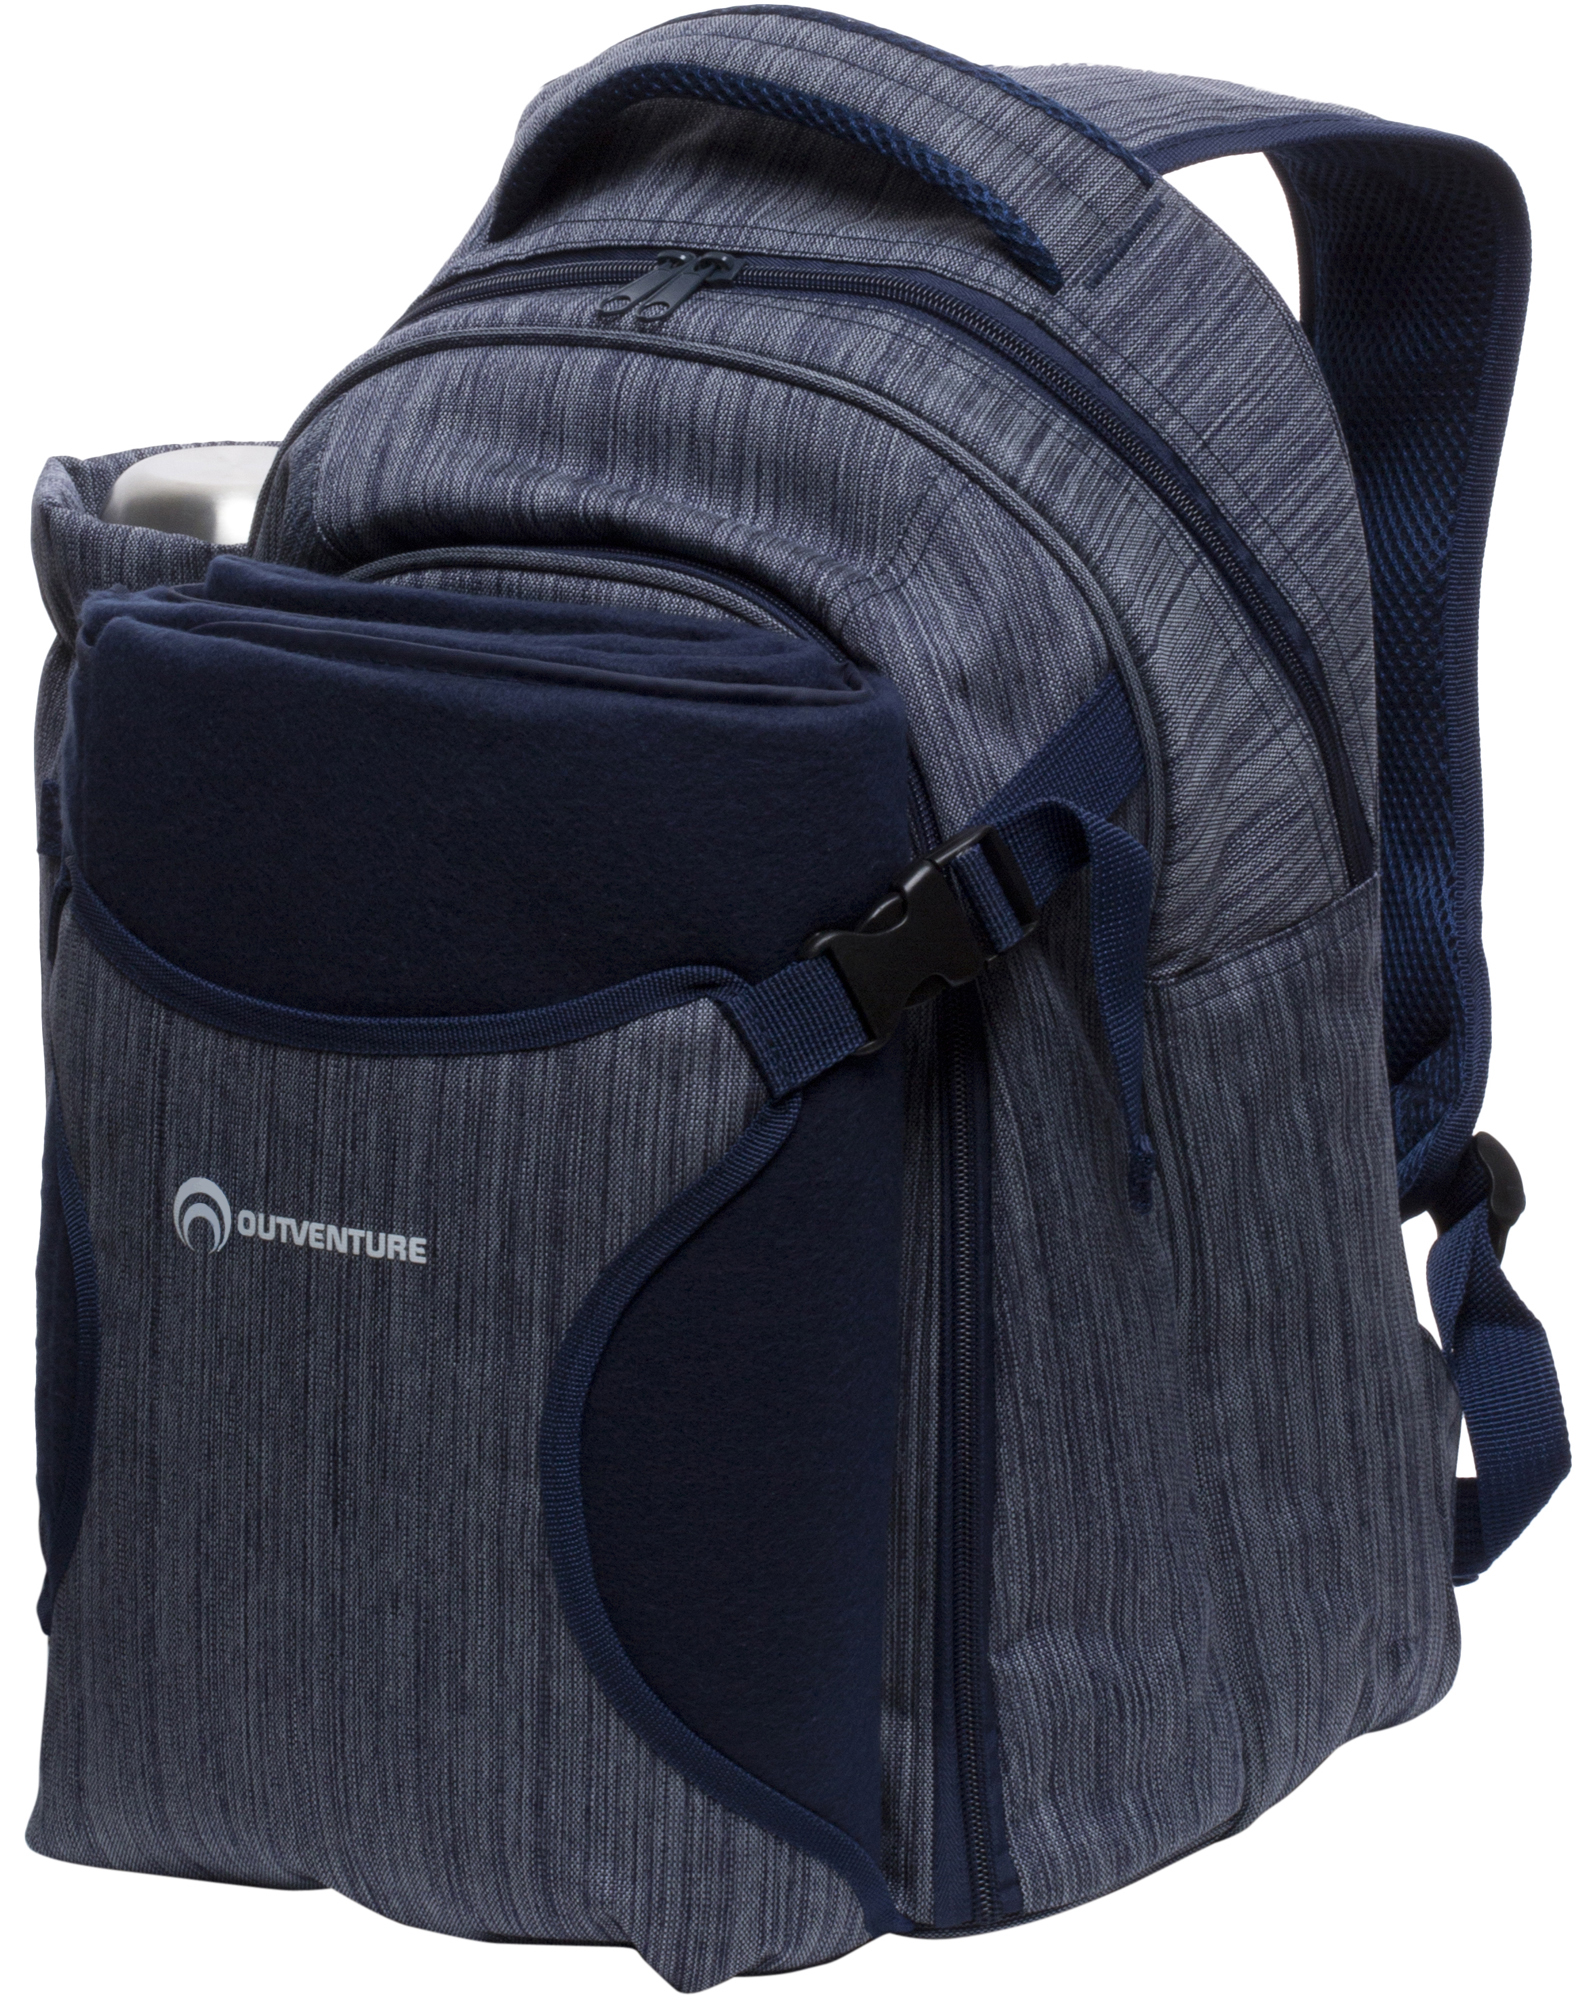 Outventure Пикниковый рюкзак Outventure, на 4 человека